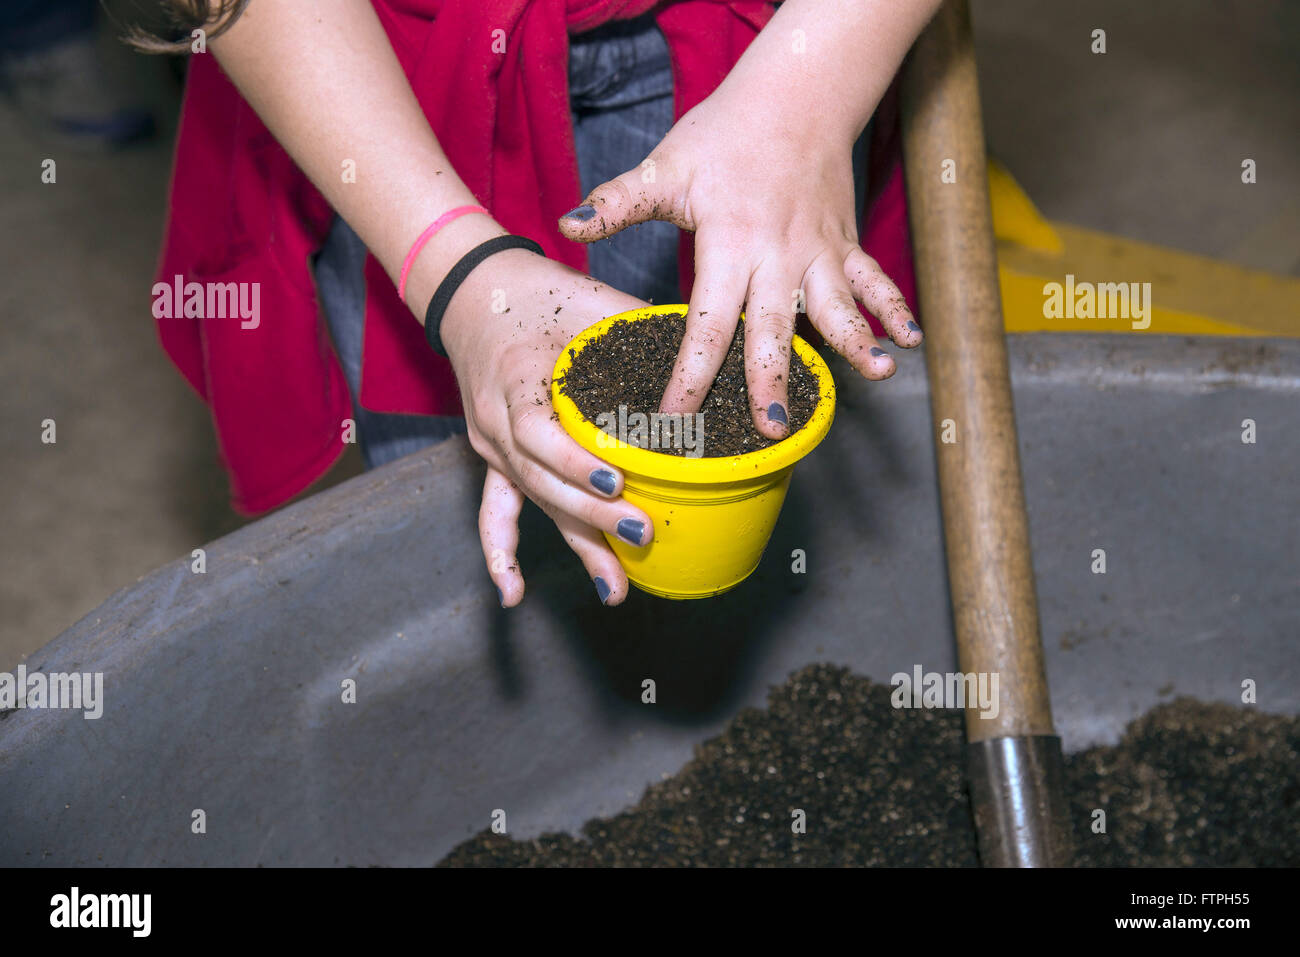 Planting seedling potted basil - Stock Image